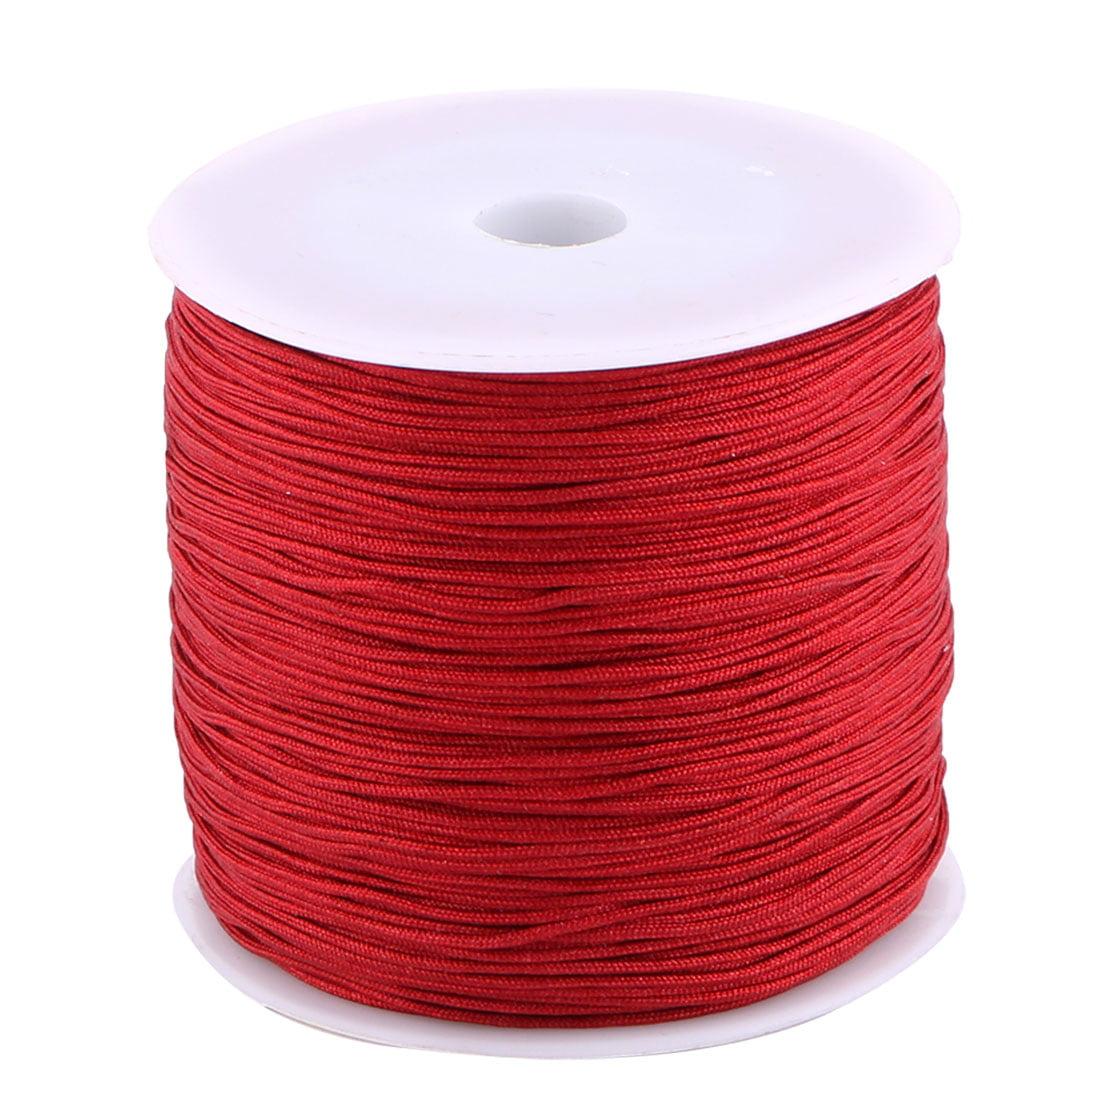 Unique Bargains Nylon DIY Craft Braided Chinese Knot Bracelet Cord String Burgundy 110 Yards